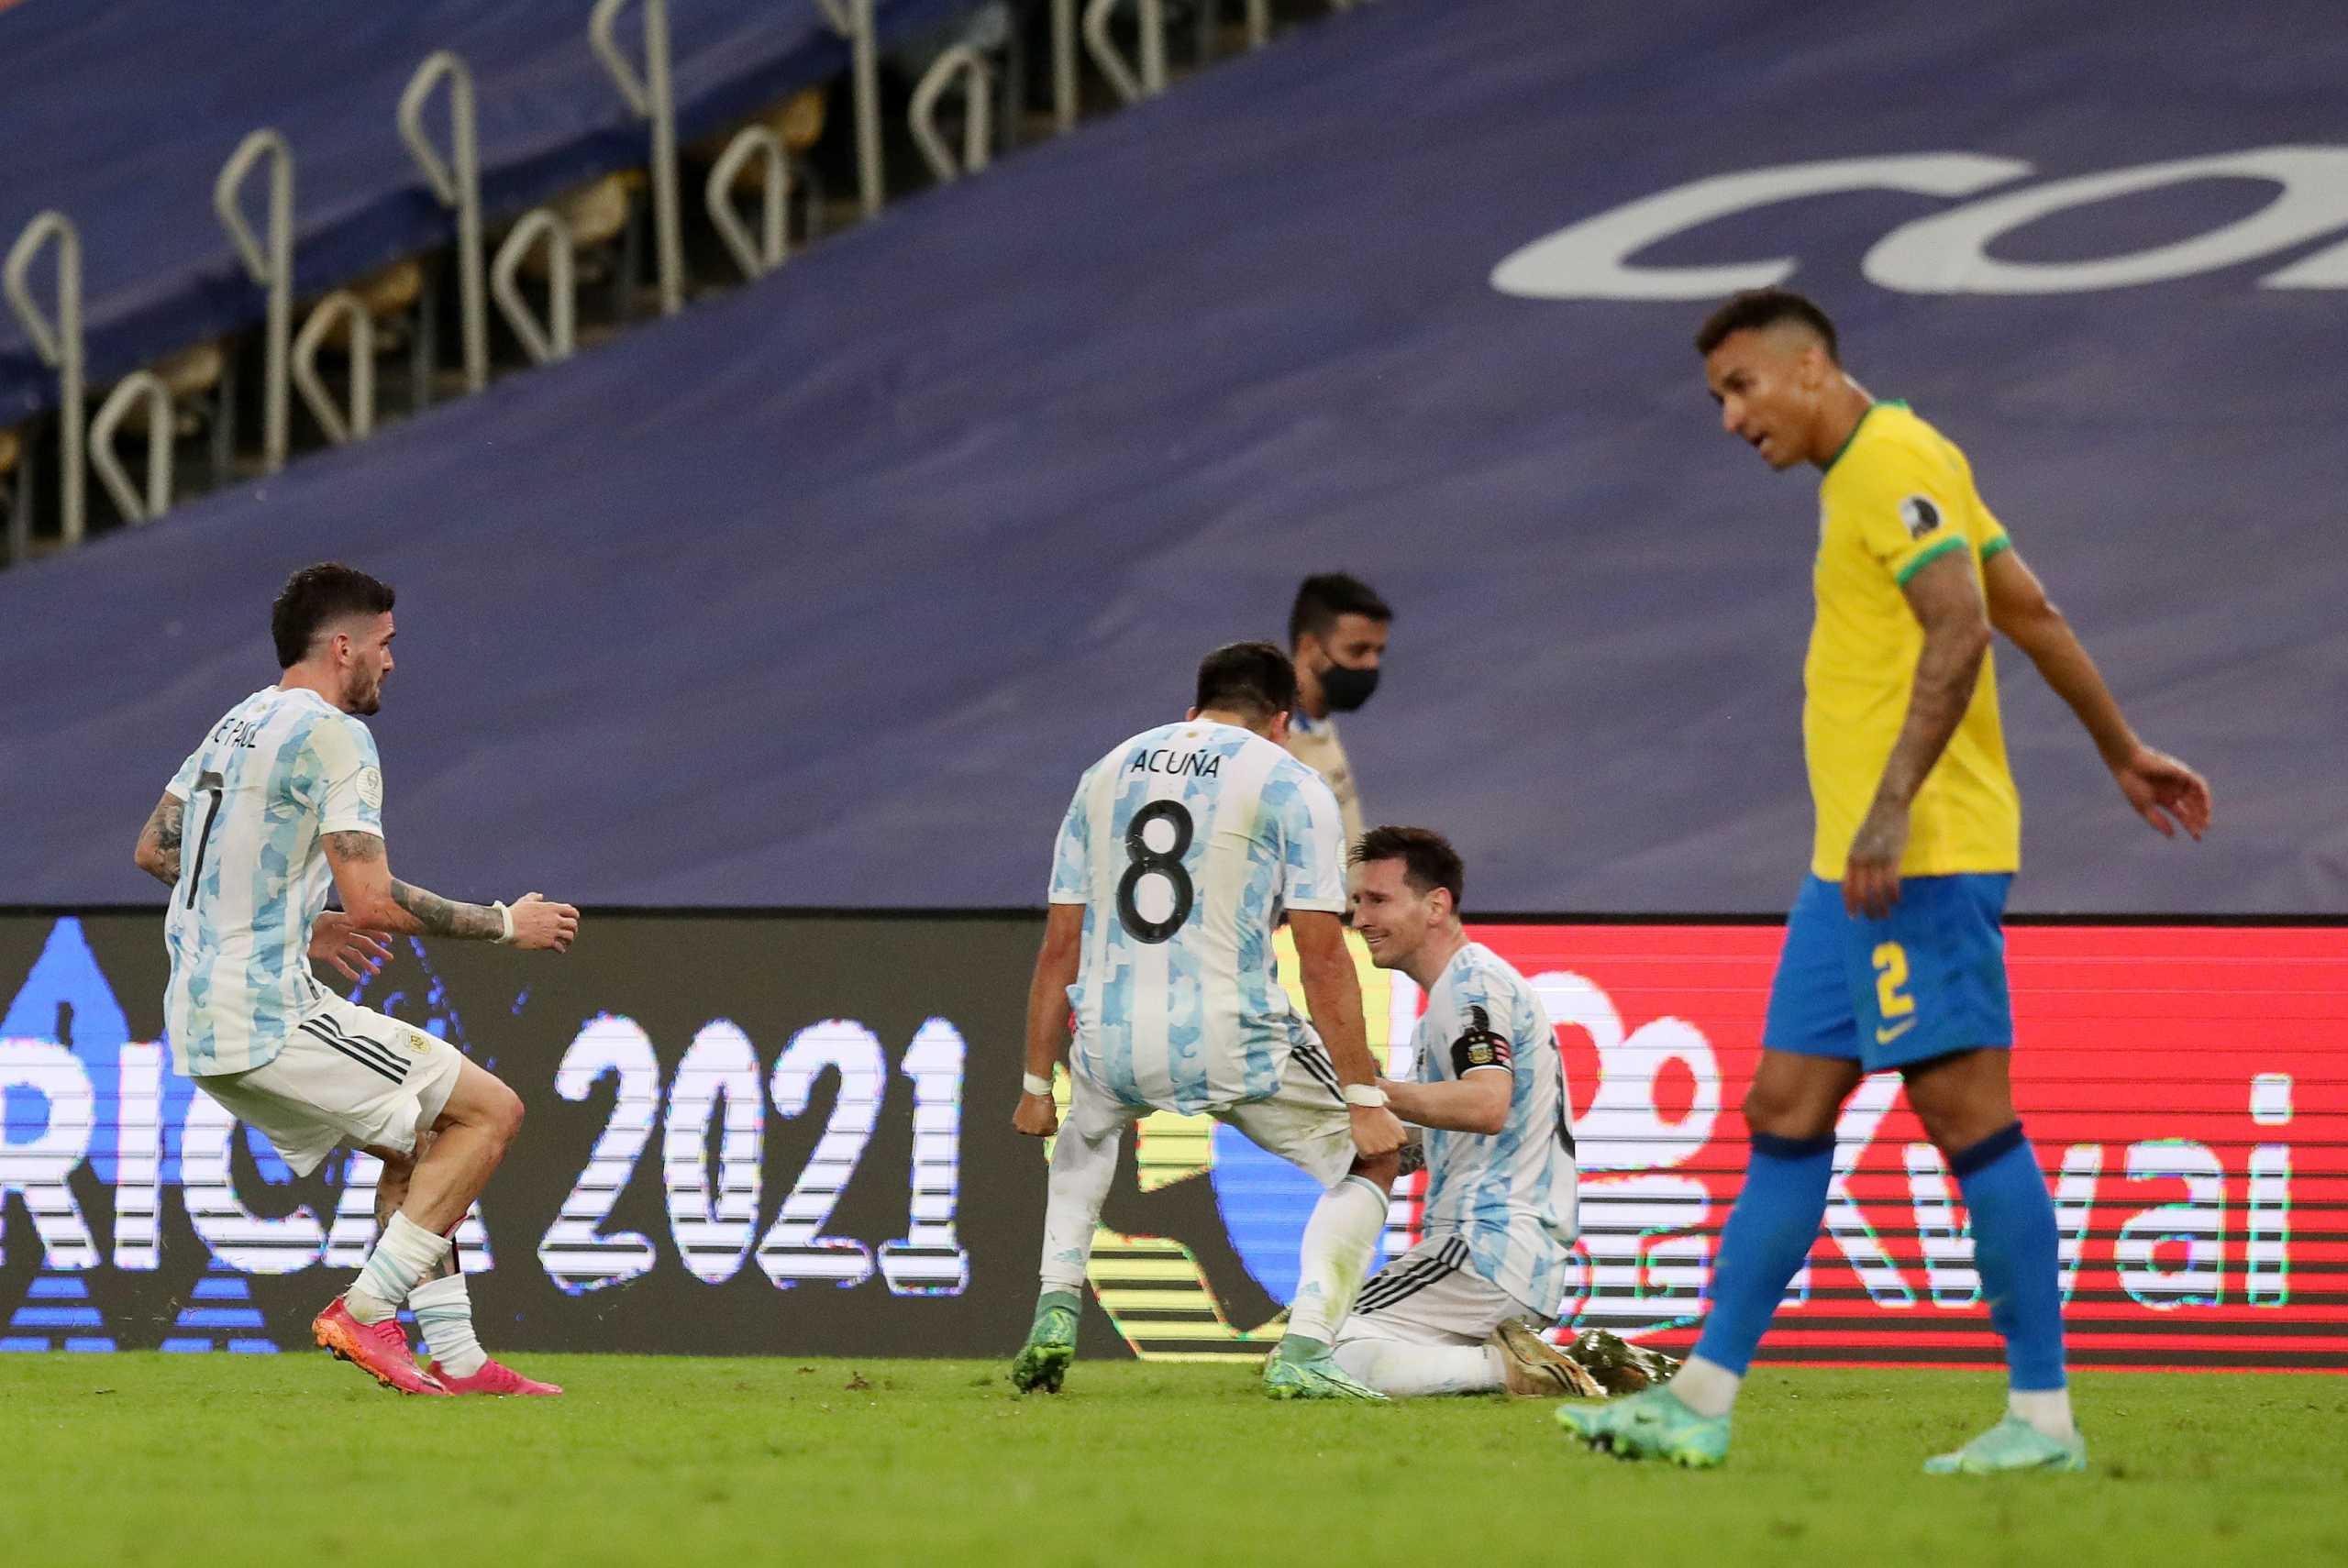 FIFA: Θέλει να «μεταμορφώσει» το ποδόσφαιρο με πέντε επαναστατικές αλλαγές